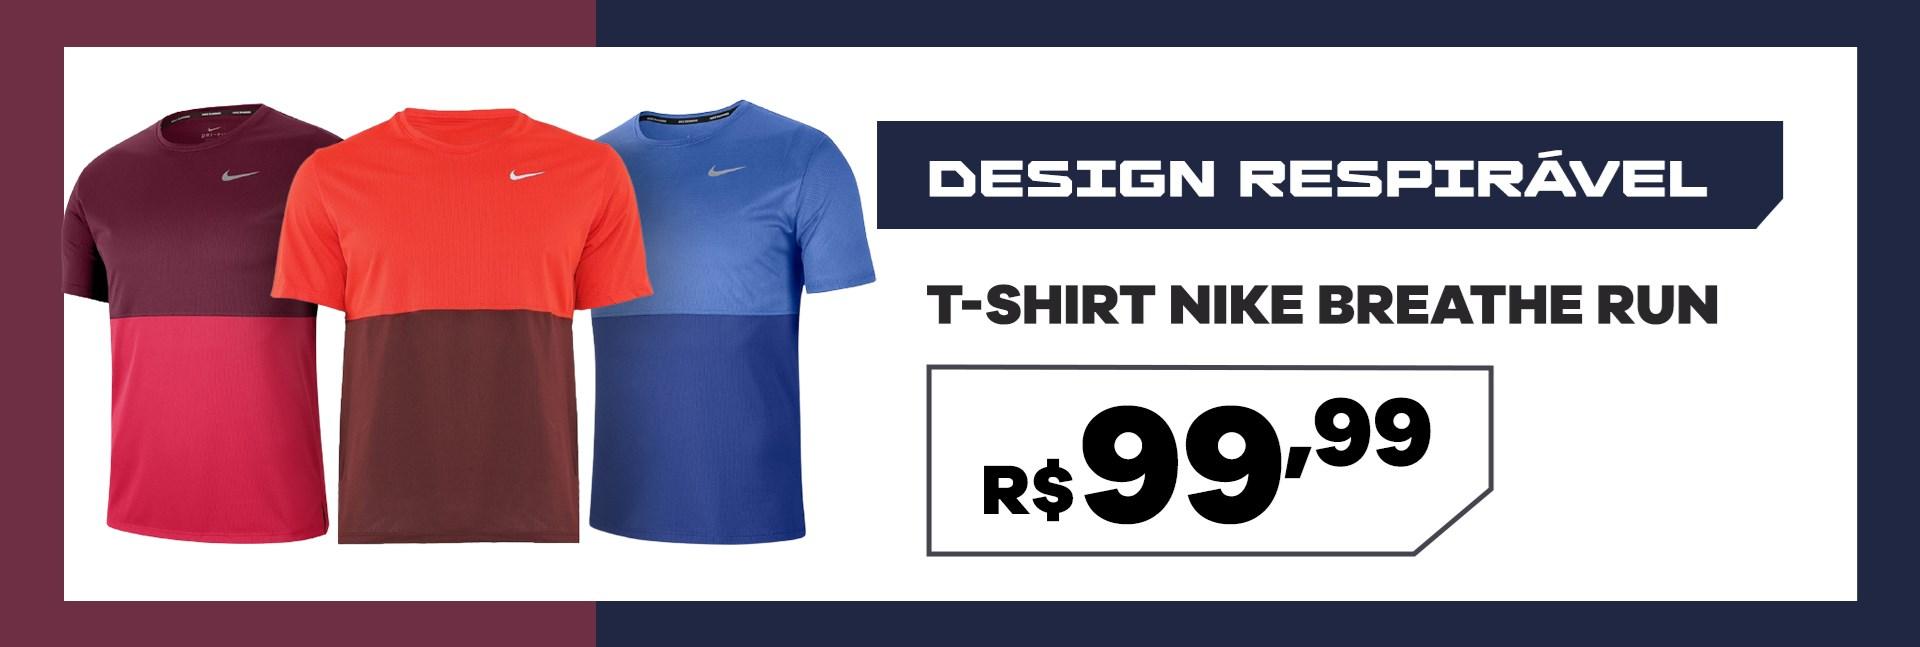 T Shirt Nike Breathe Run